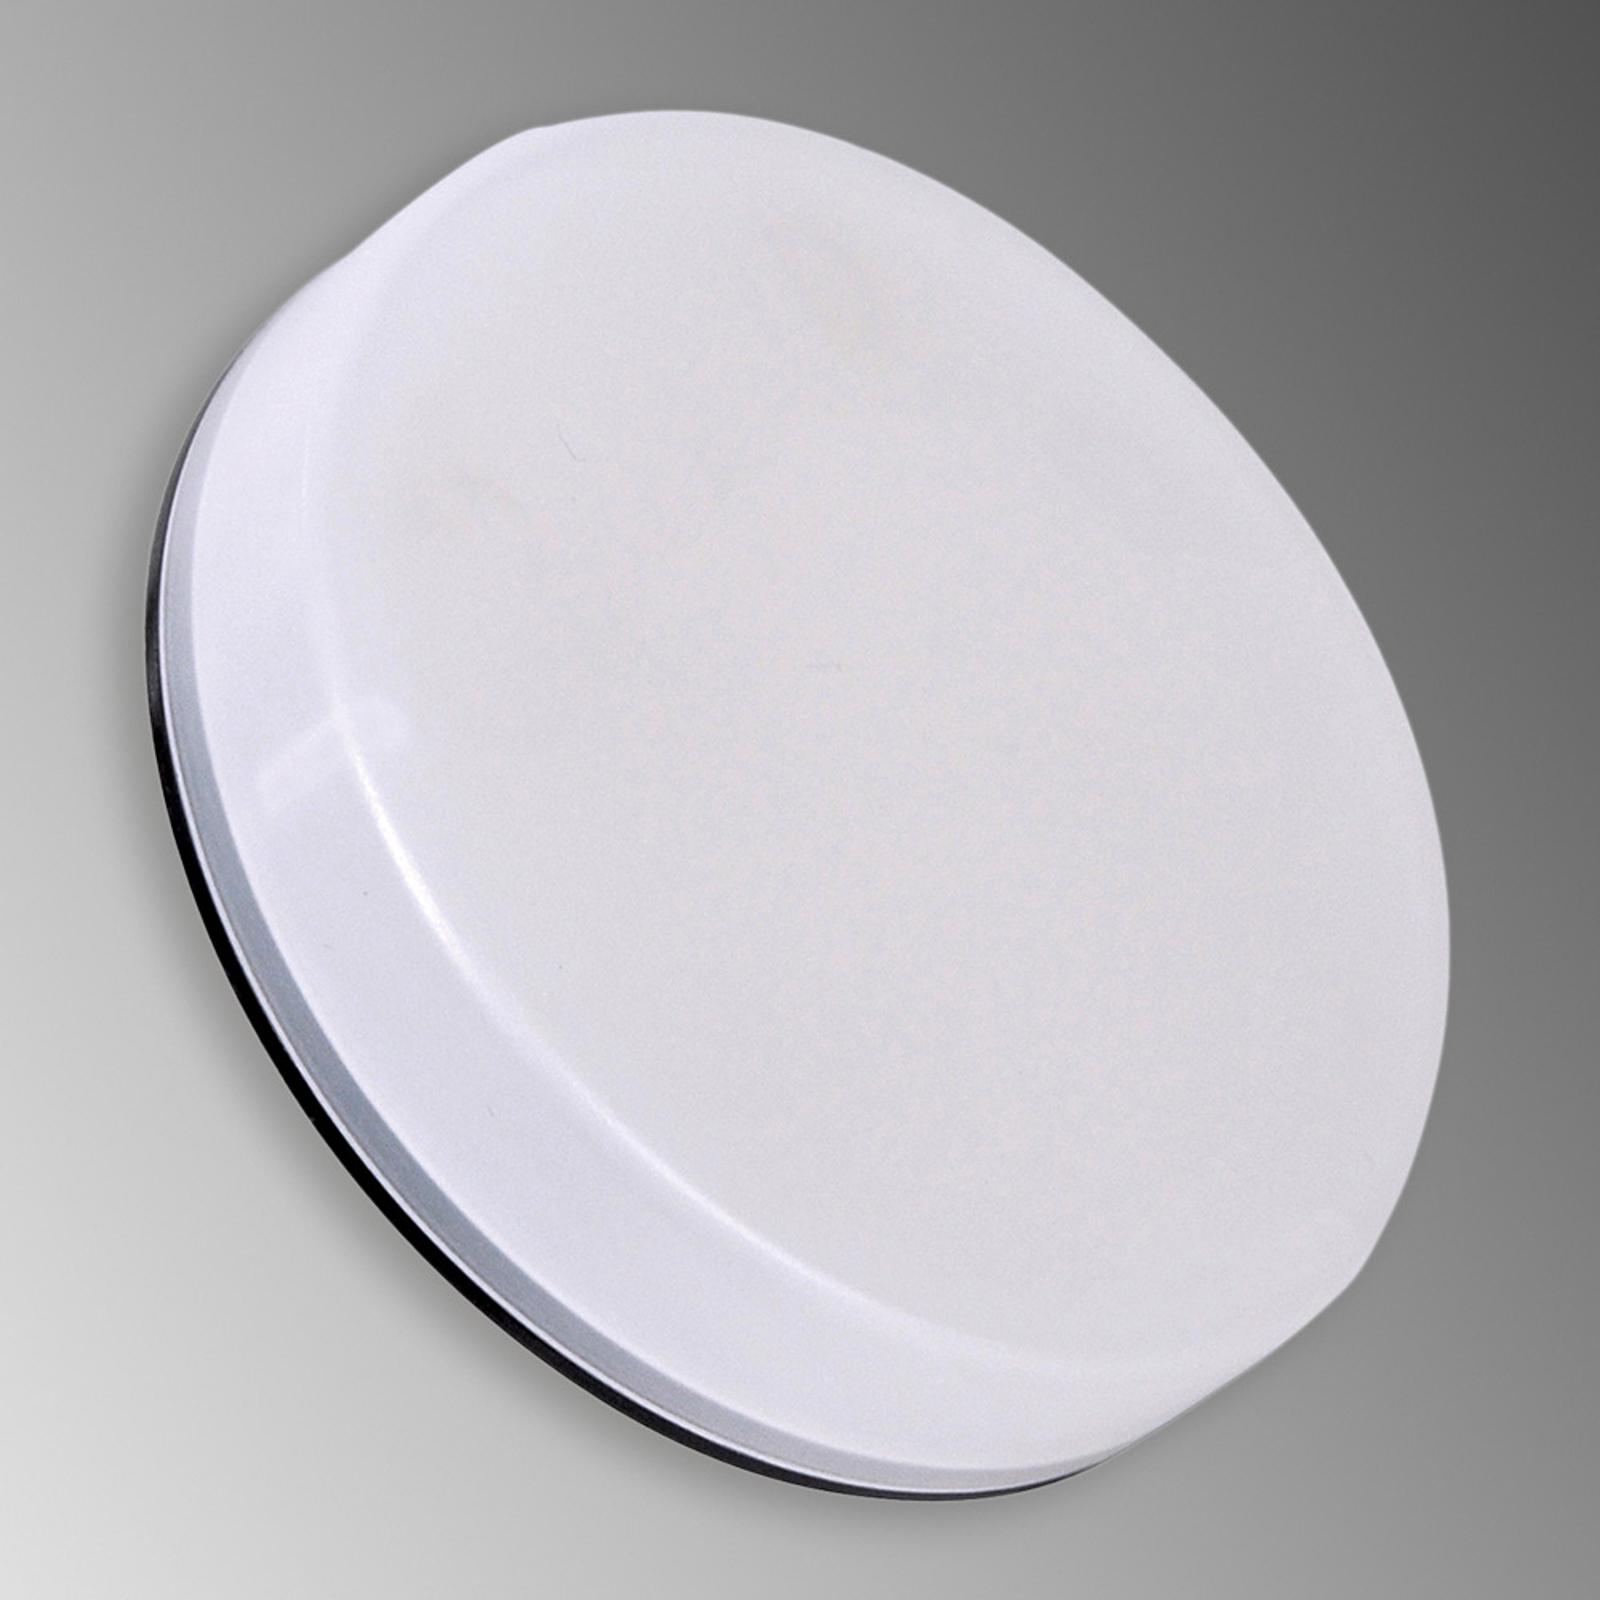 MicroLynx LED-lampe GX53 5 W 470 lm, mat, 3.000 K